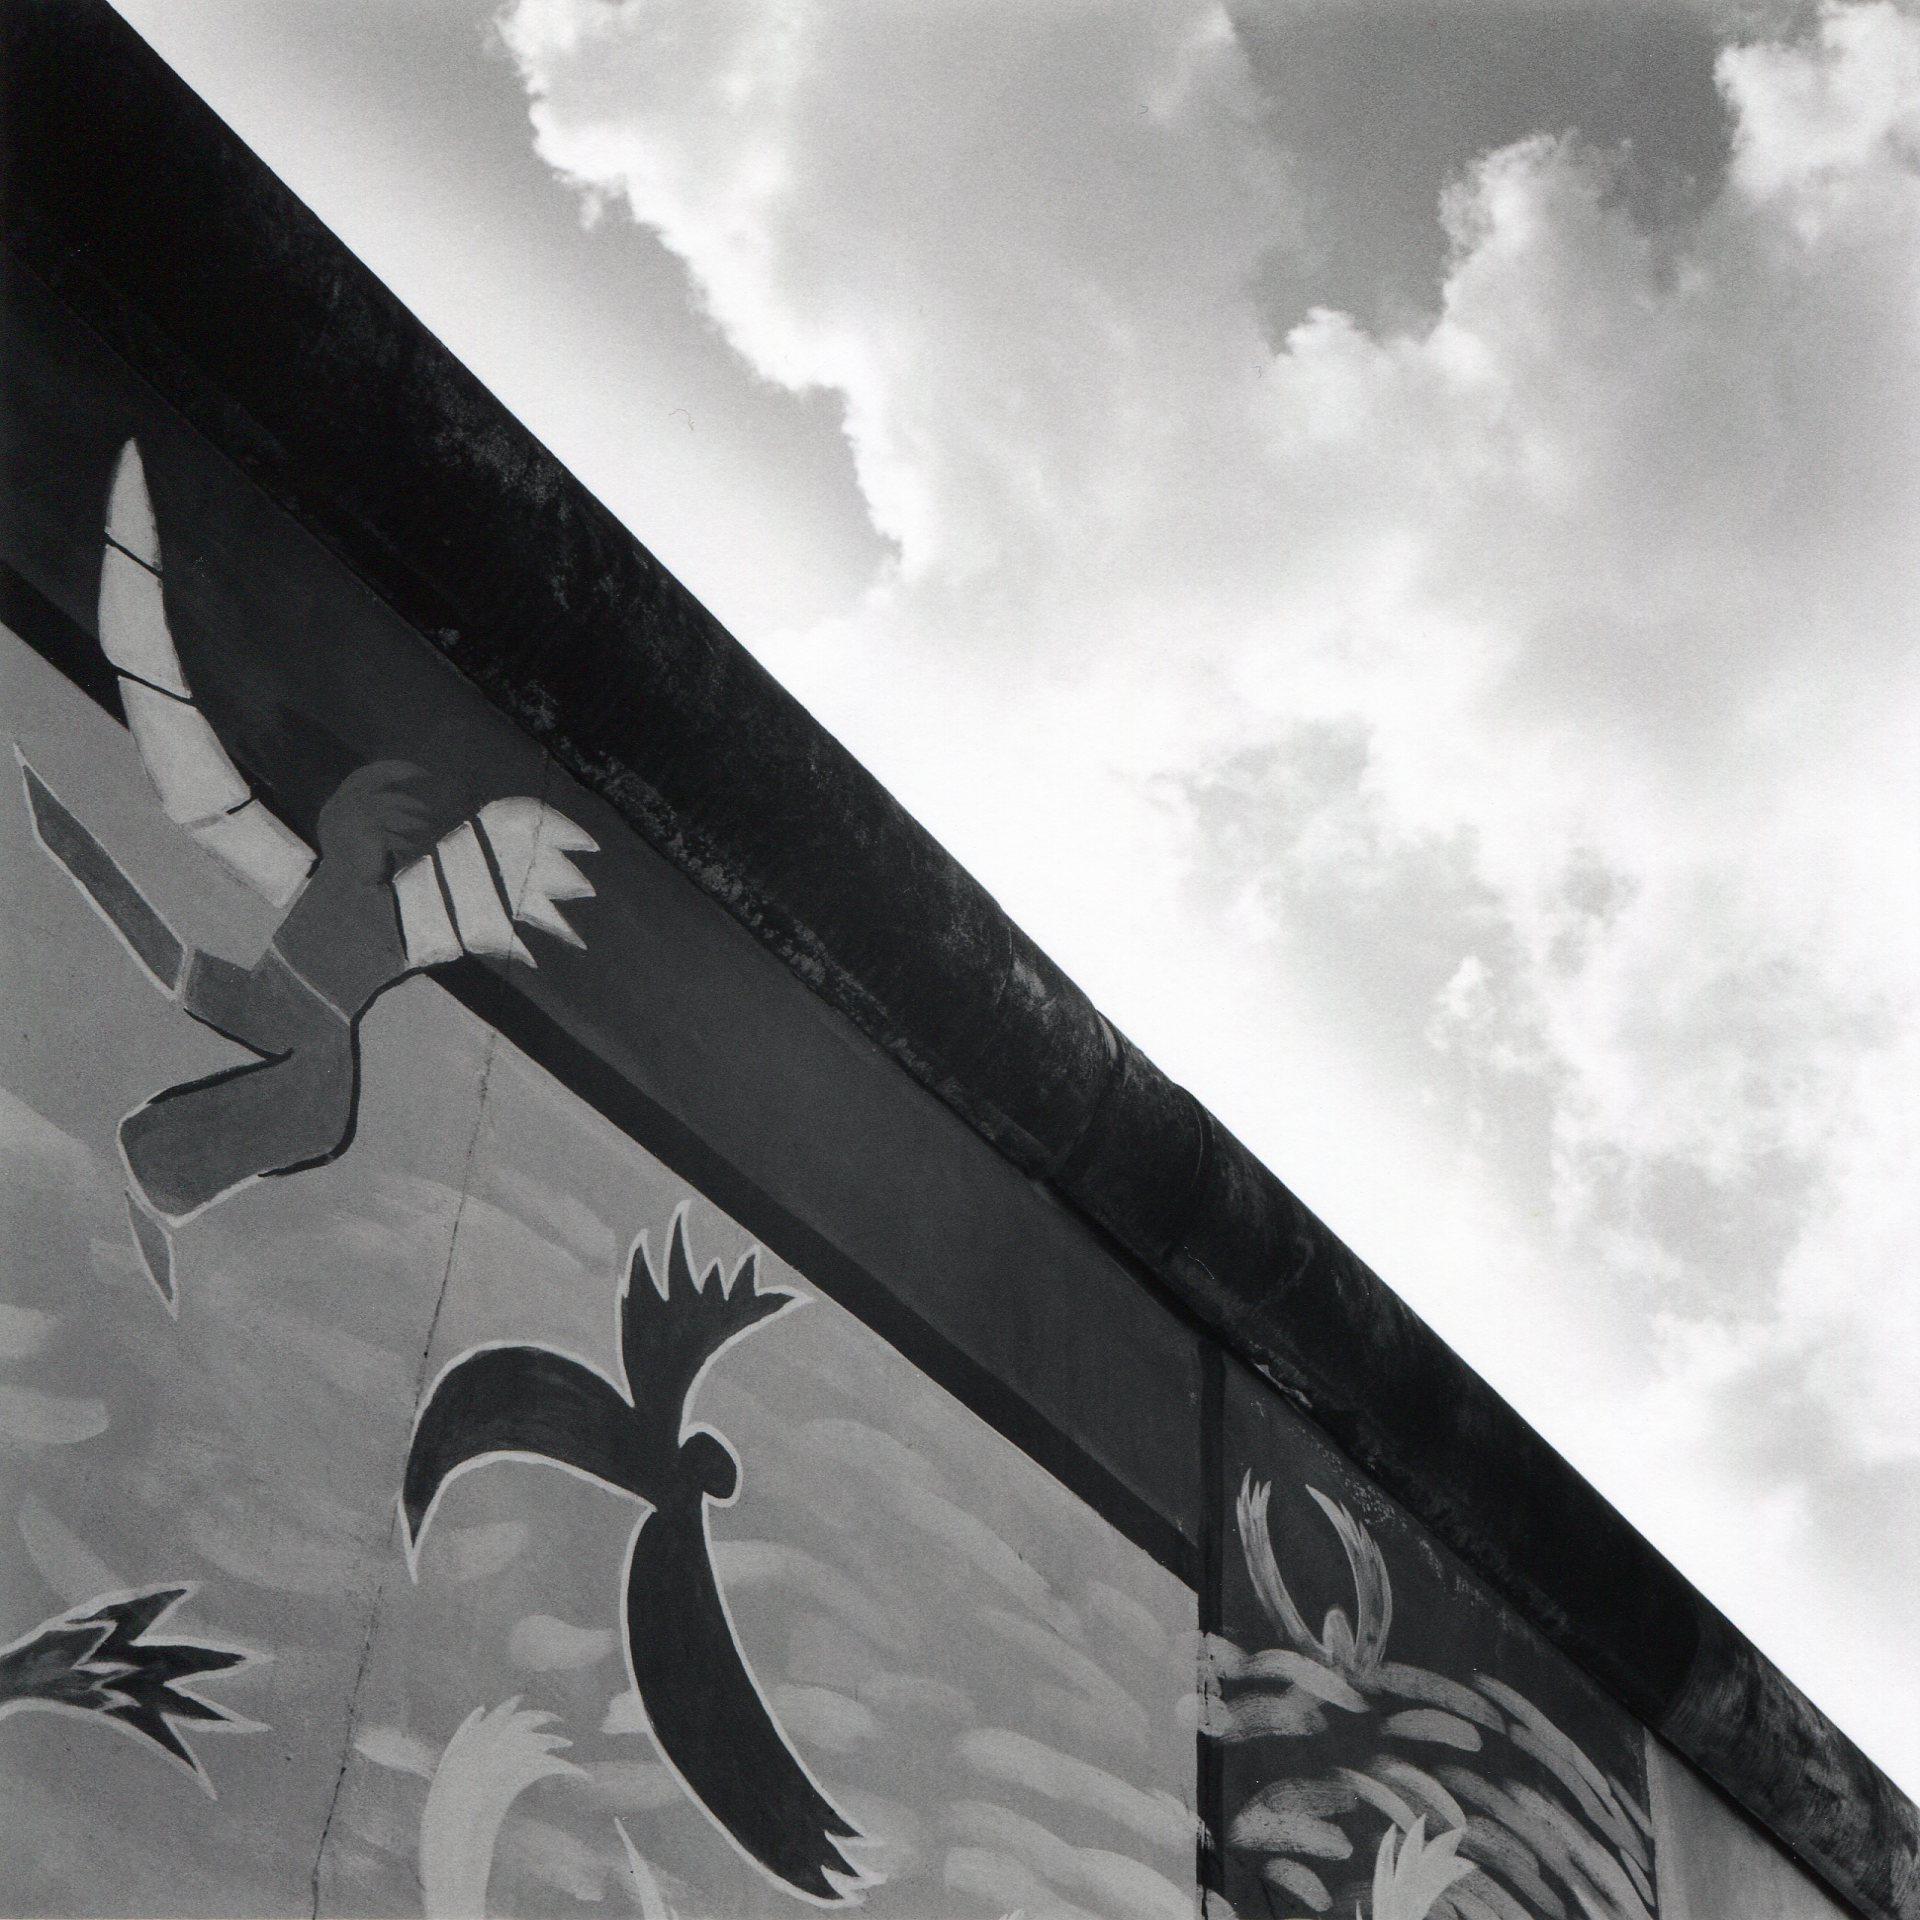 East Side Gallery, Berlino, Giugno 2013